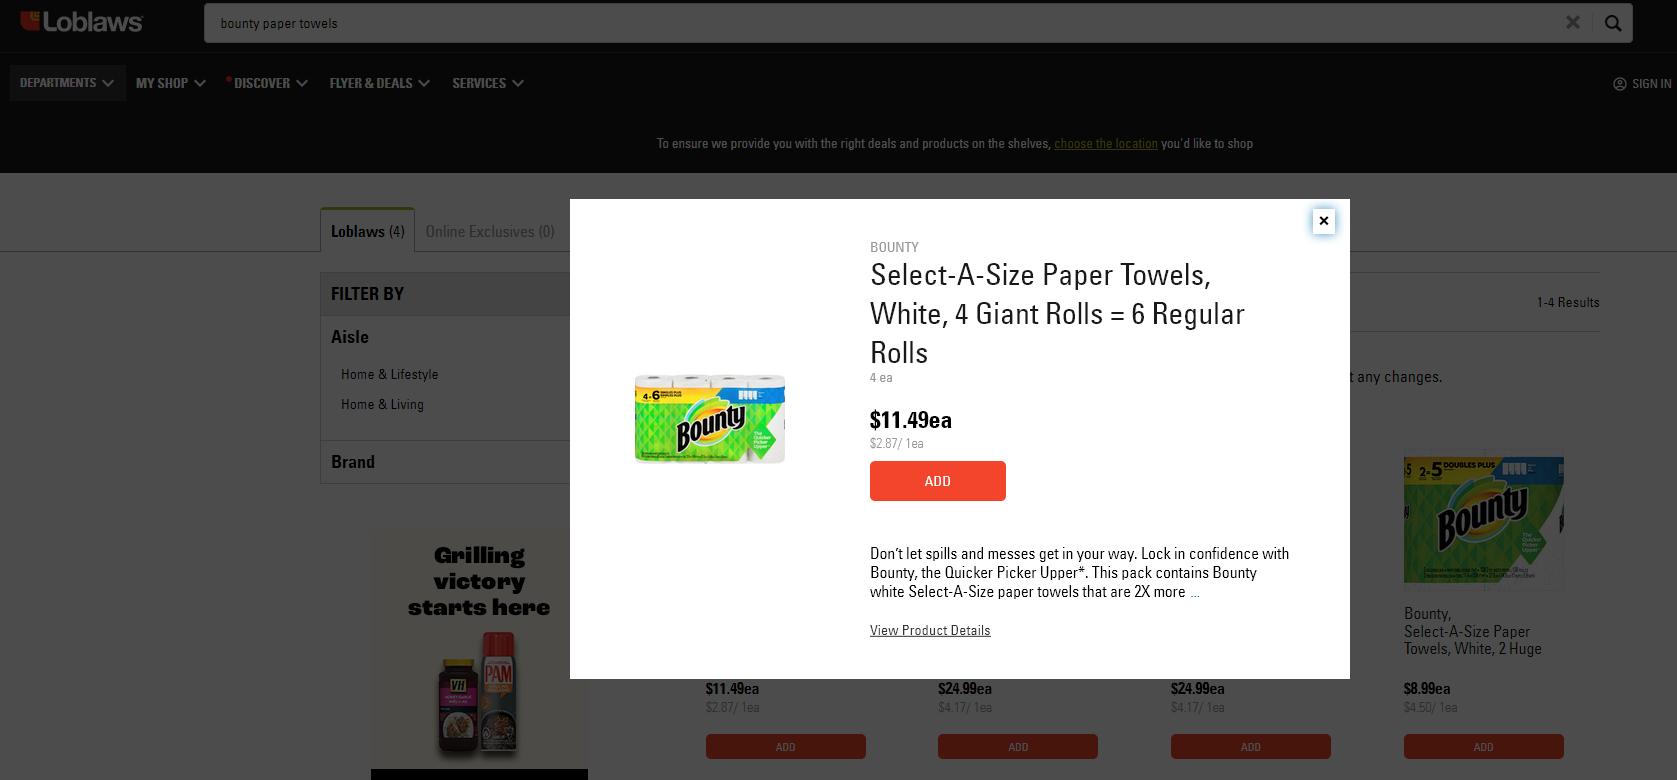 AterImber.com - No. Mad. - Zero Waste - Starting Your Zero Waste Journey - Loblaws Bounty Paper Towels Price - low waste, zero waste, sustainability, save the planet, single use plastics